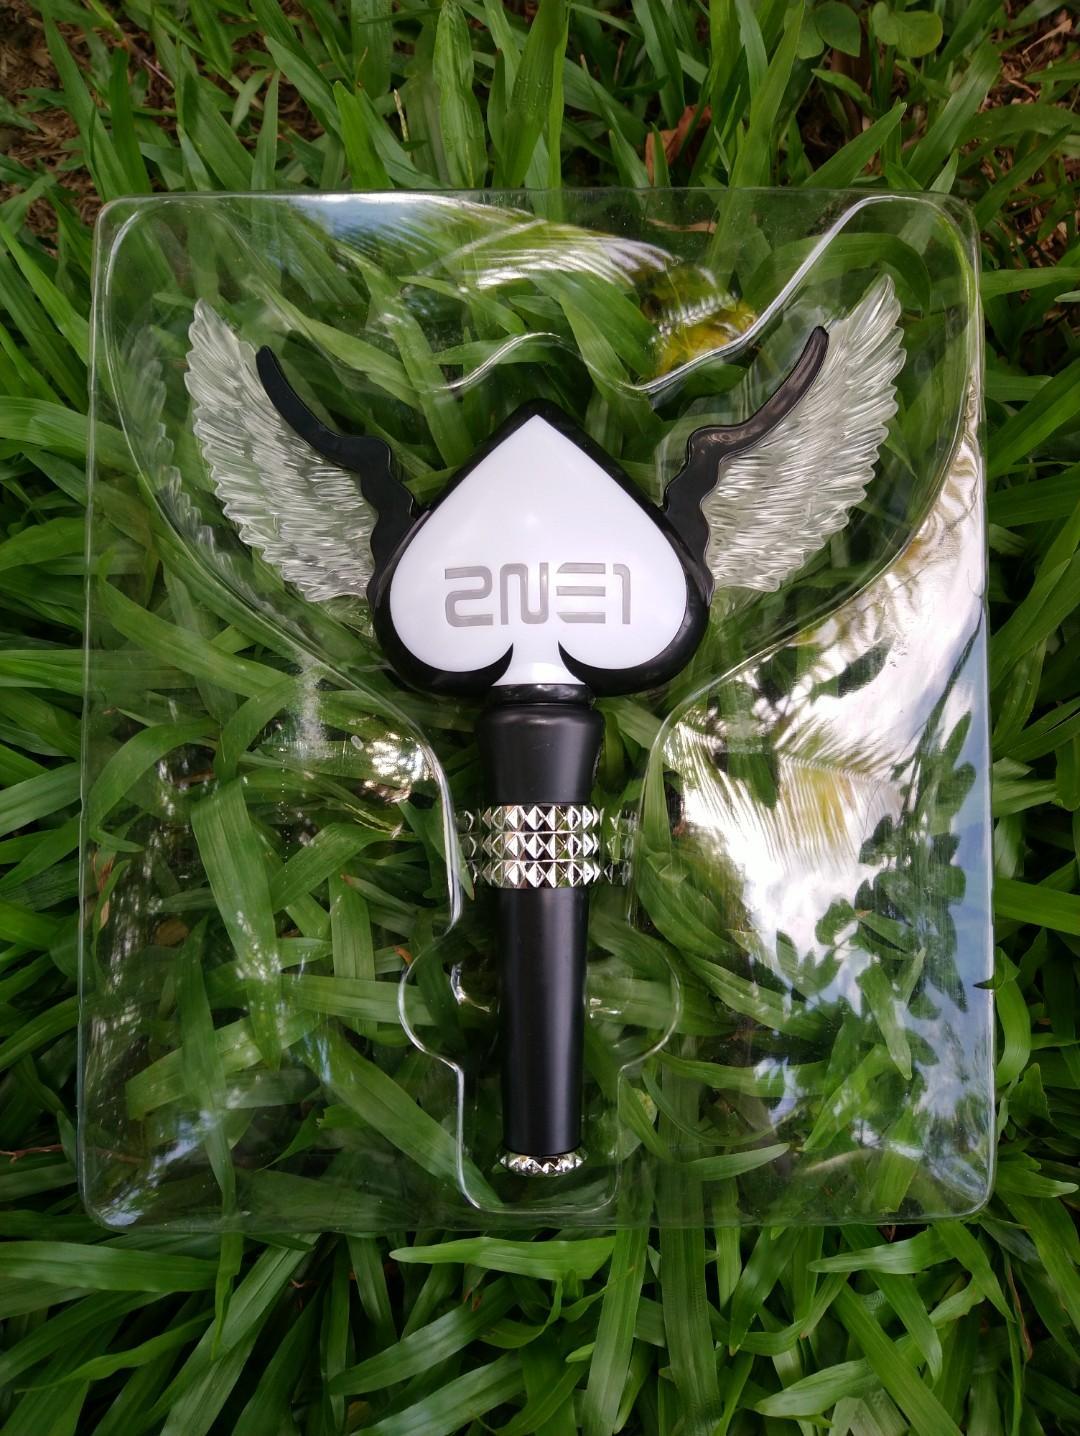 2ME1-Wing Stick Light(Korea ver 2.0,Japan Edition)-**with free Souvenir